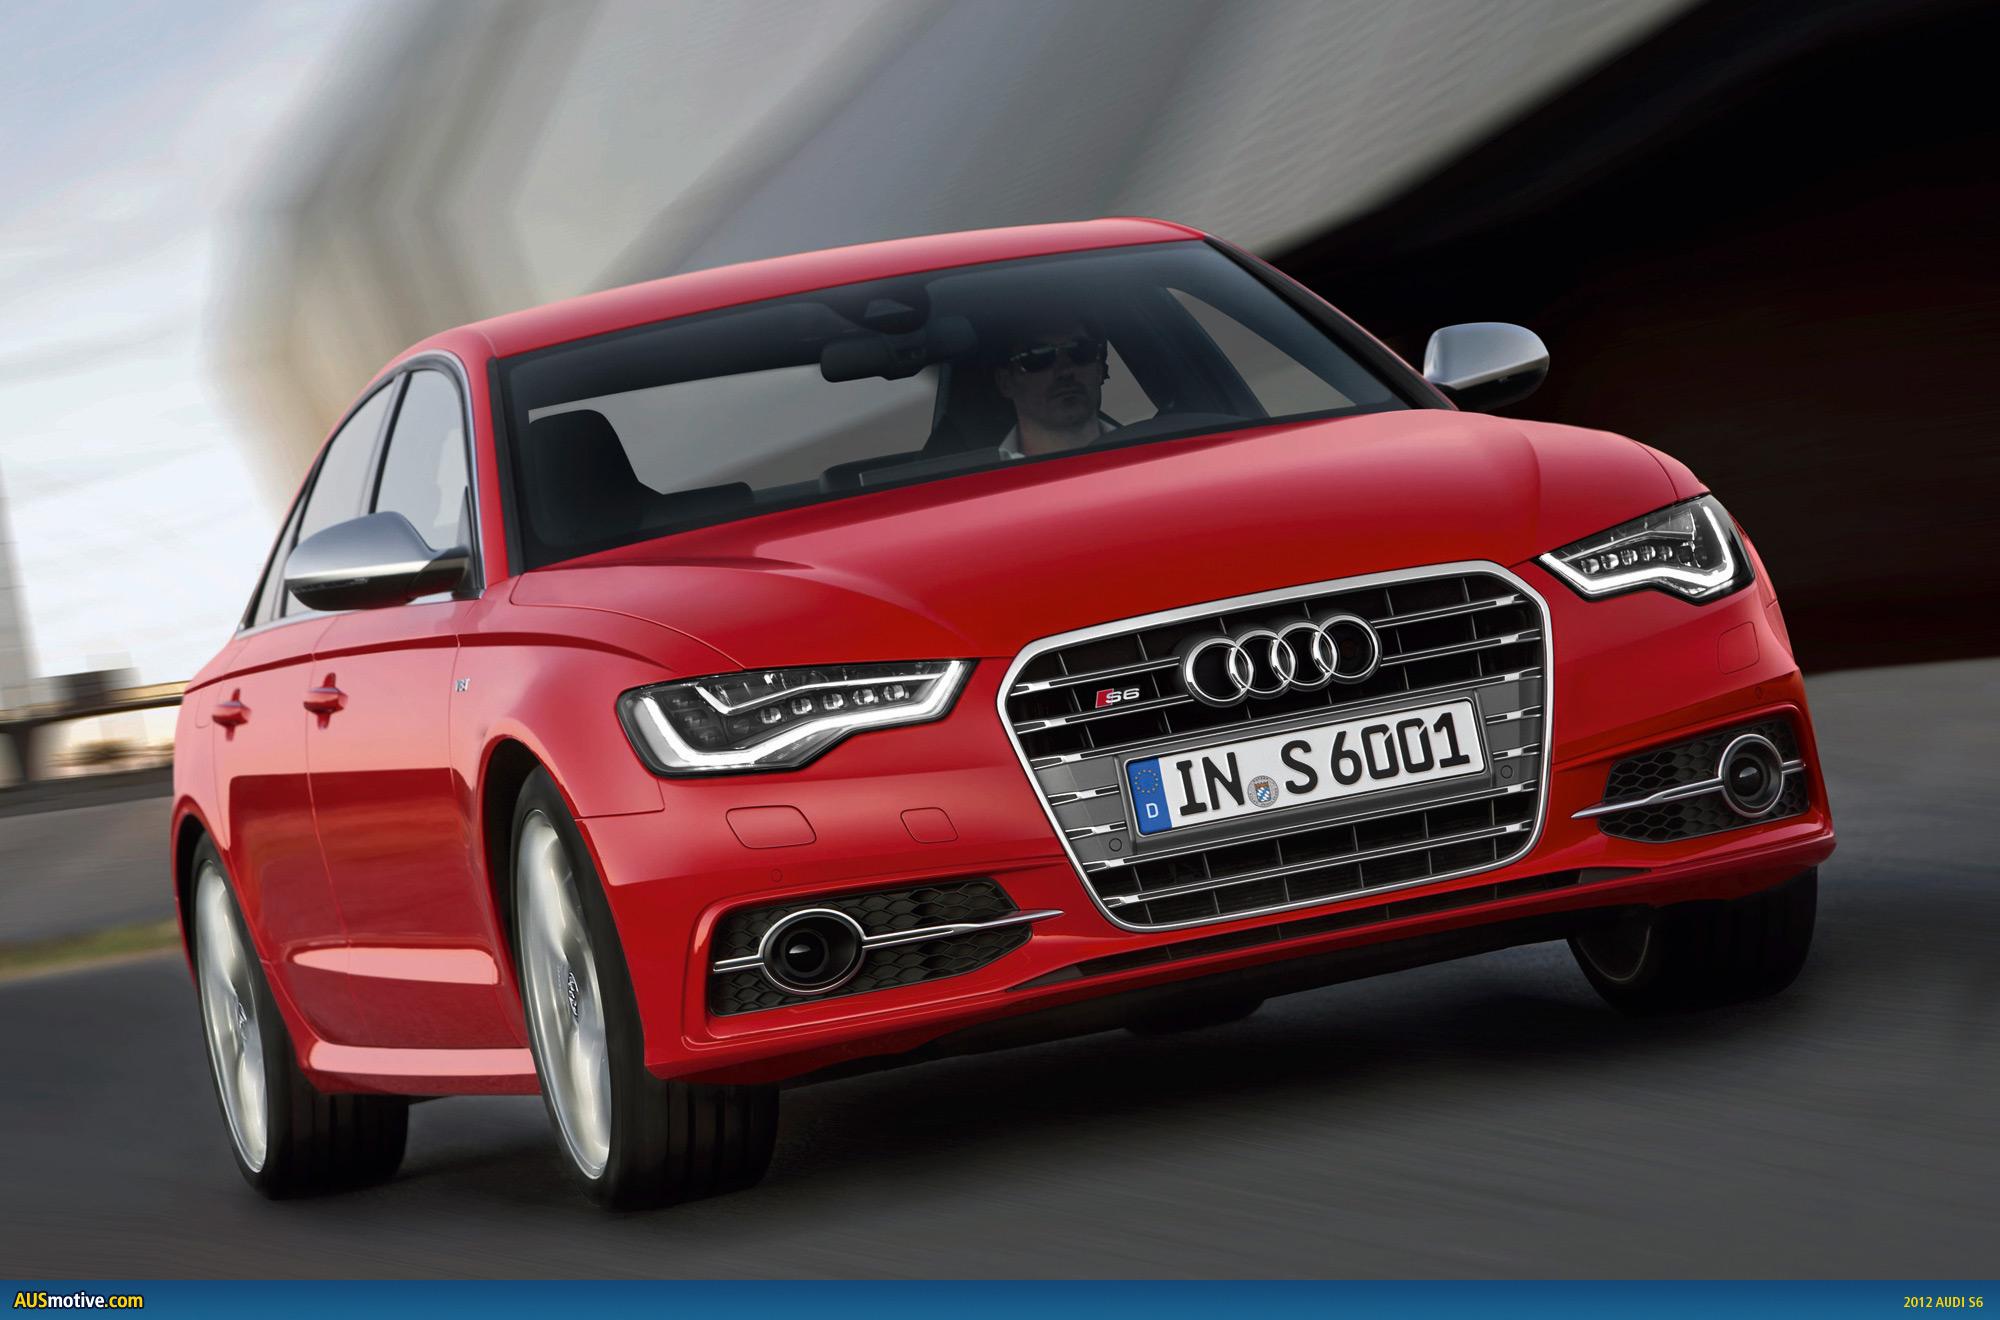 Ausmotivecom 2012 Audi S6 Photo Gallery